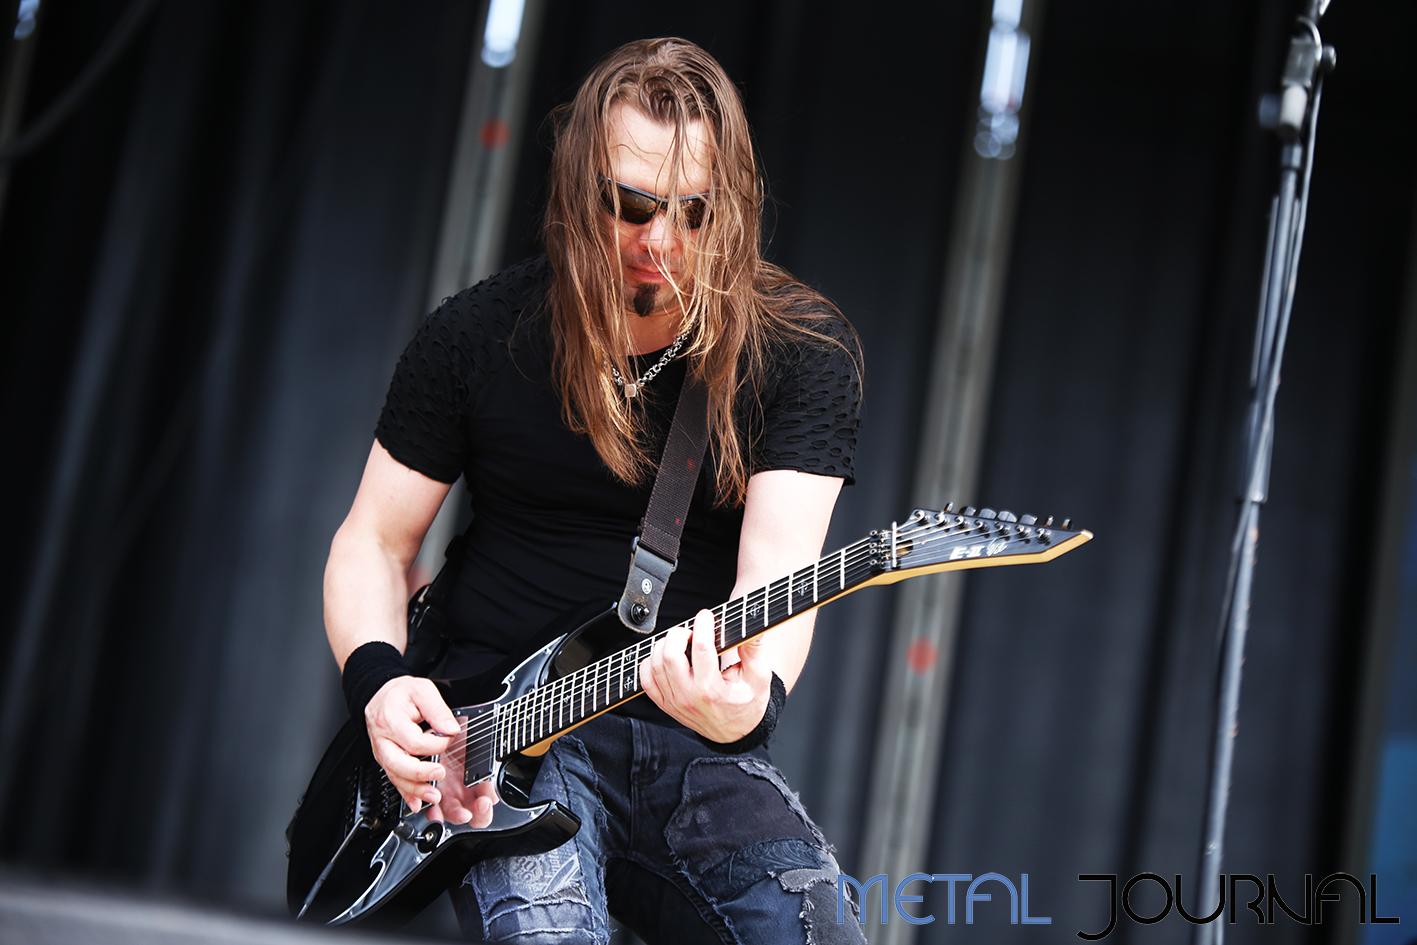 sonata arctica - metal journal rock fest barcelona 2019 pic 2